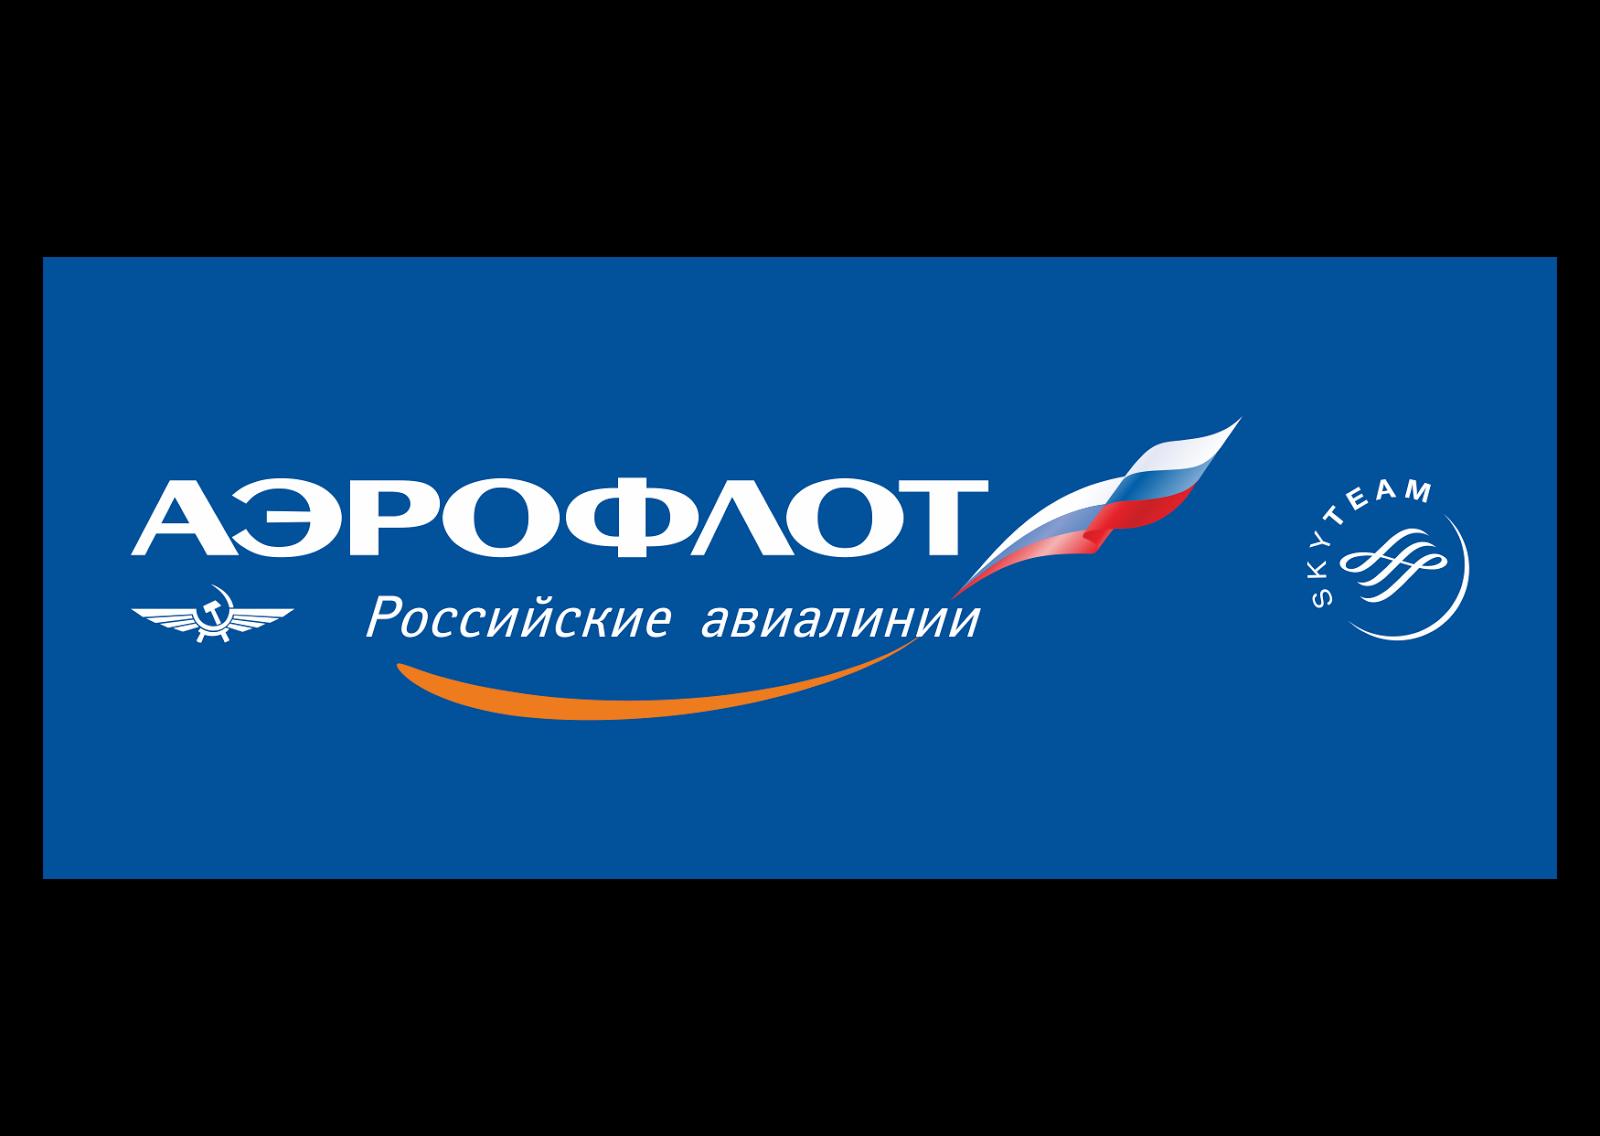 Aeroflot Russian Airlines Logo Vector - Aeroflot Logo PNG